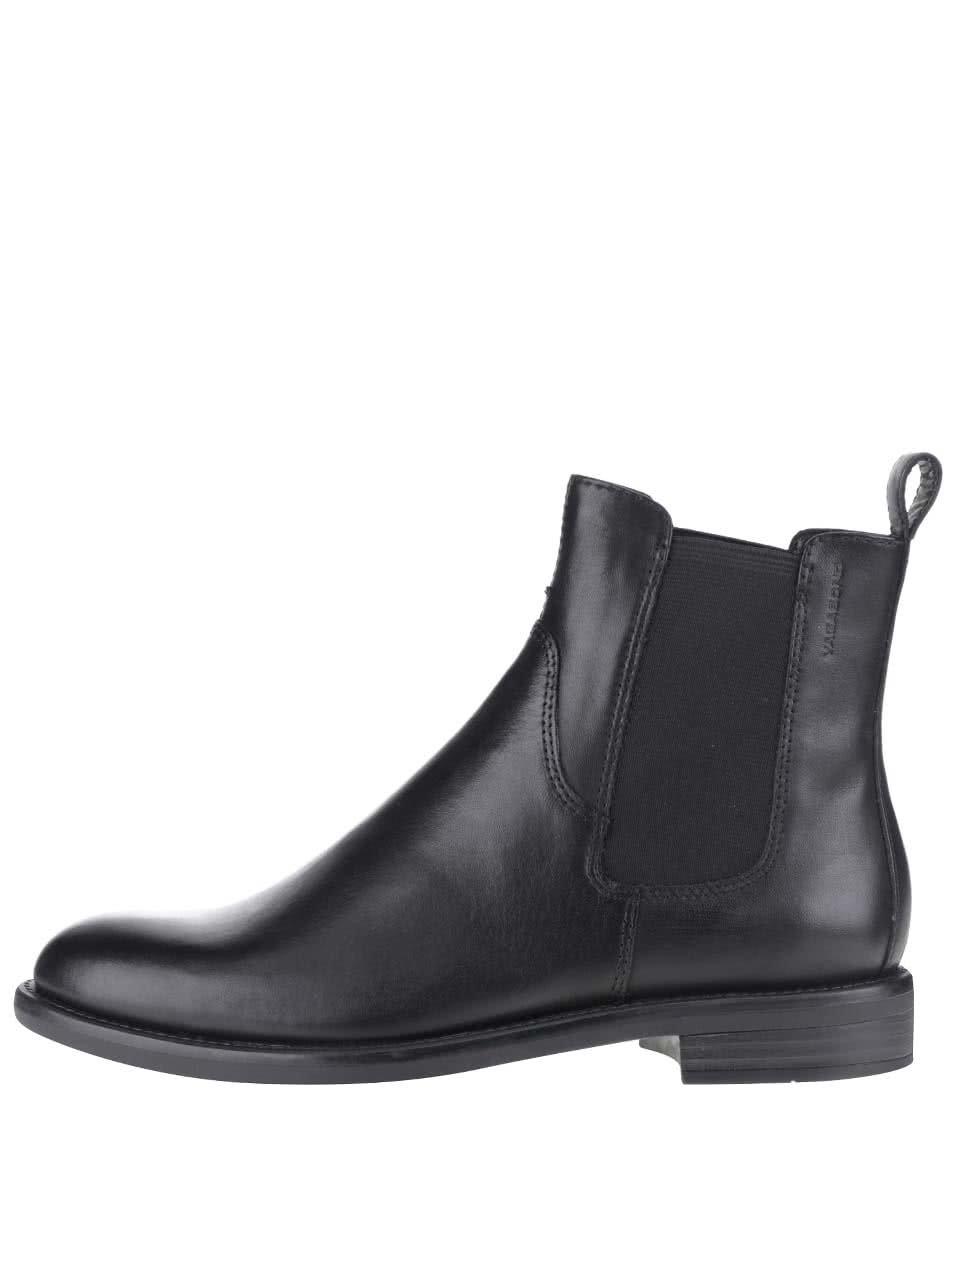 Černé dámské kožené chelsea boty Vagabond Amina ... d39c439142